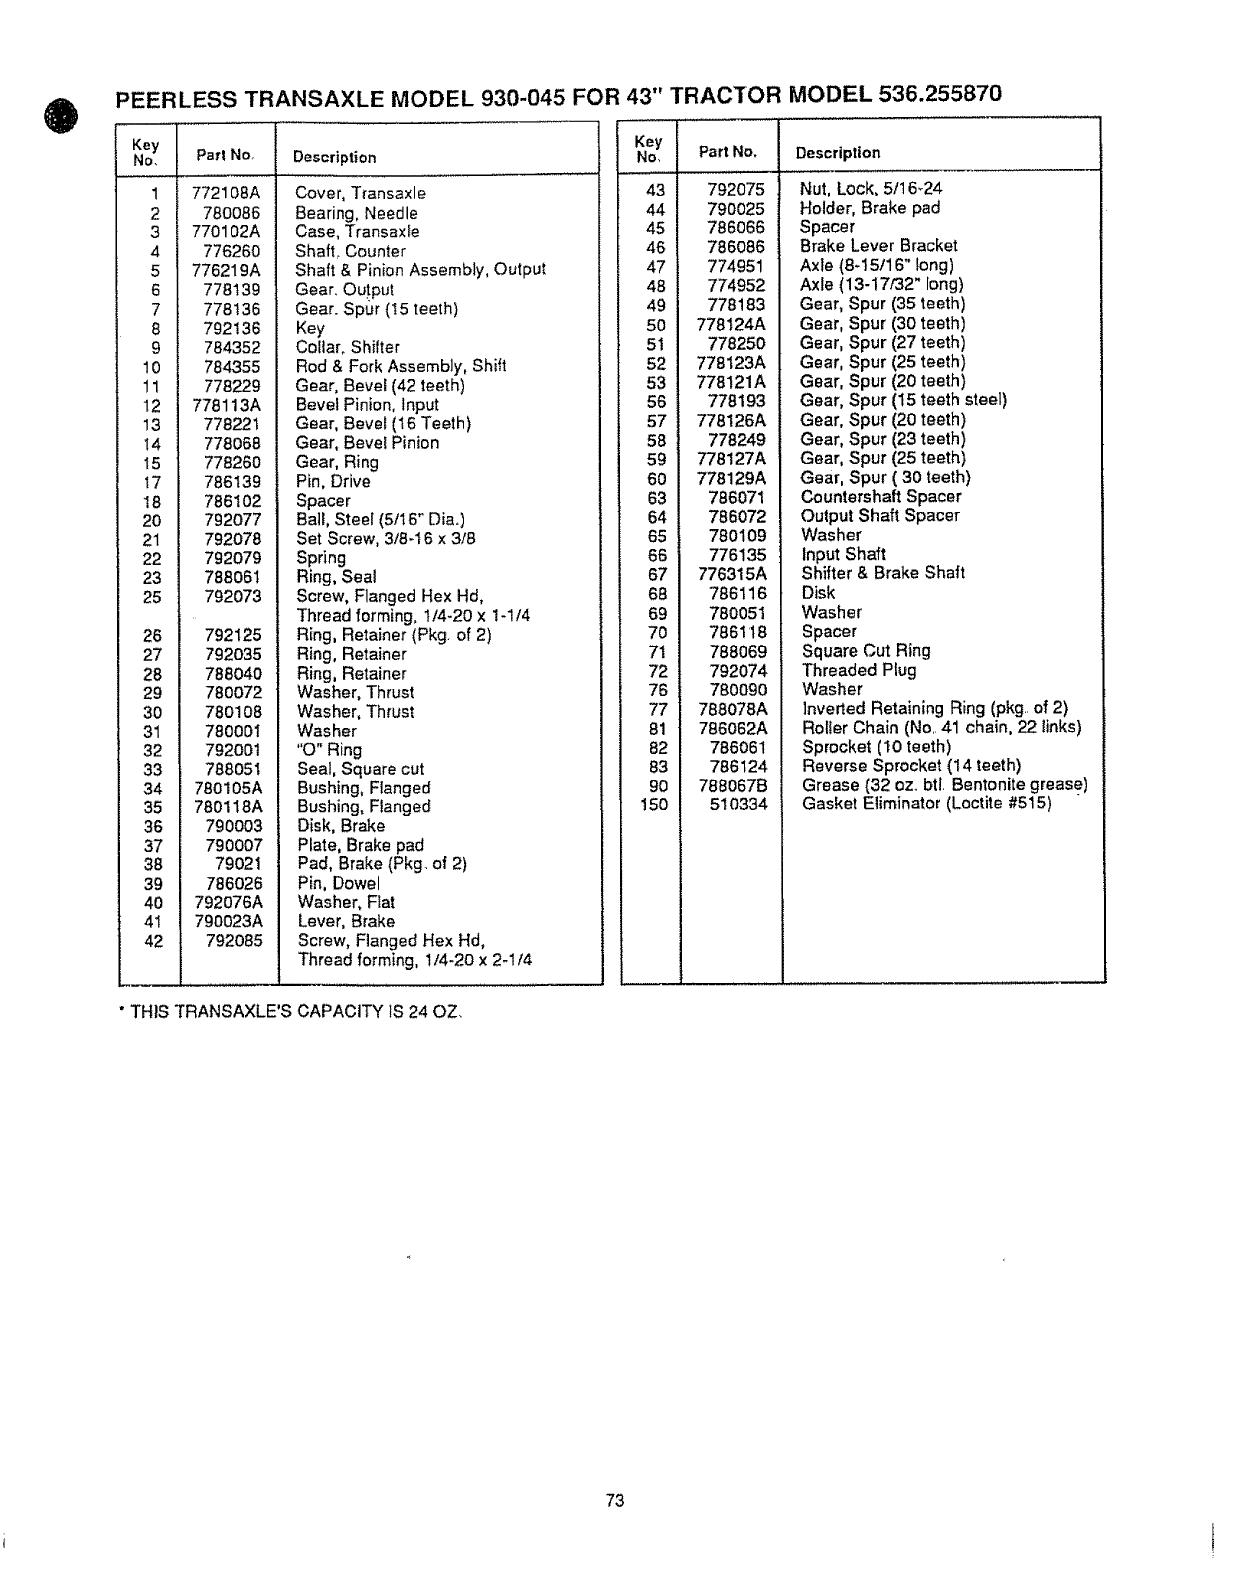 Sears 536 25587 PEERLESS TRANSAXLE MODEL 930-045 FOR 43